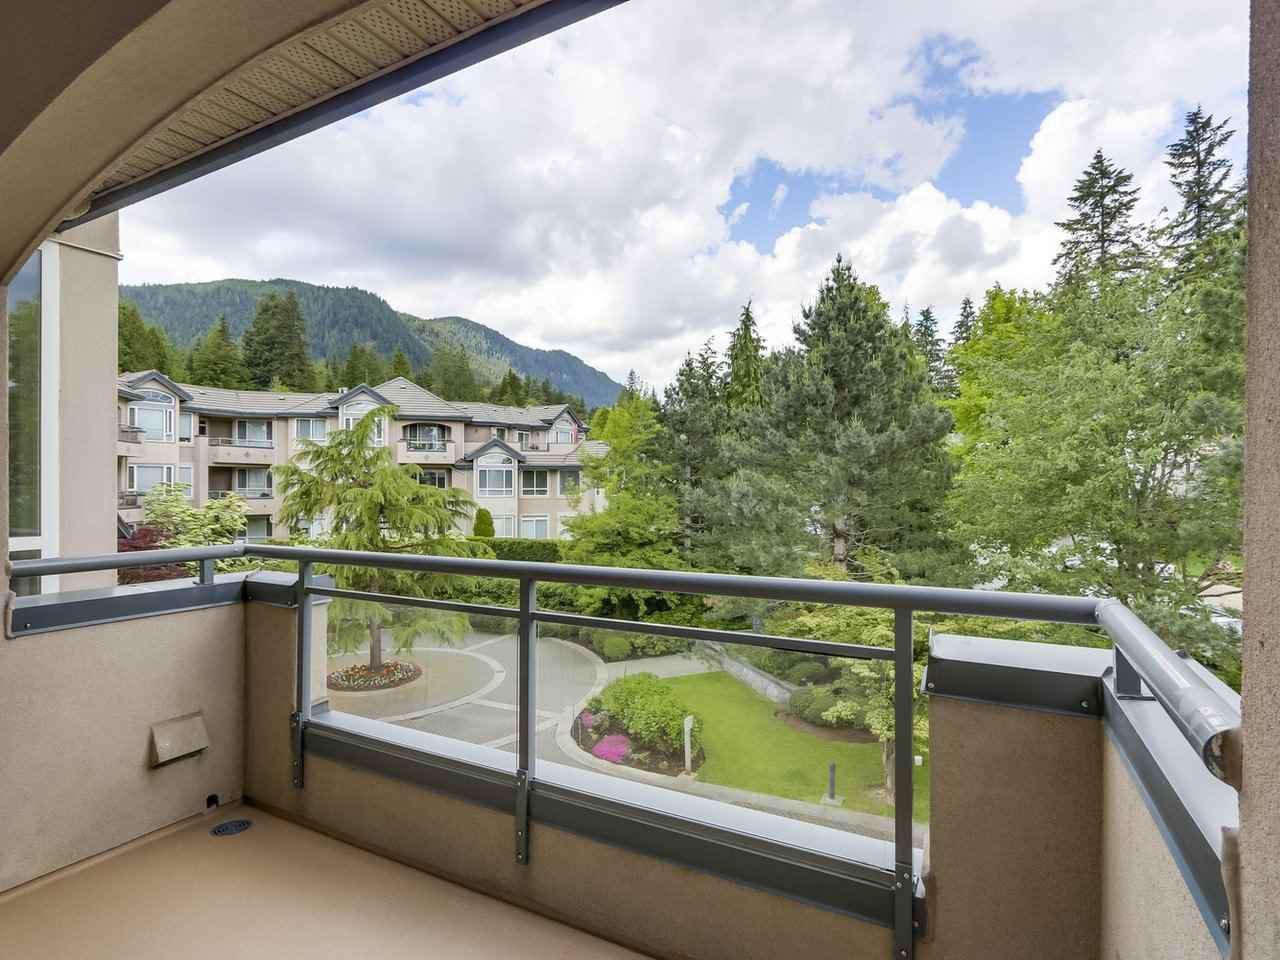 Photo 17: Photos: 303 3280 PLATEAU BOULEVARD in Coquitlam: Westwood Plateau Condo for sale : MLS®# R2275918